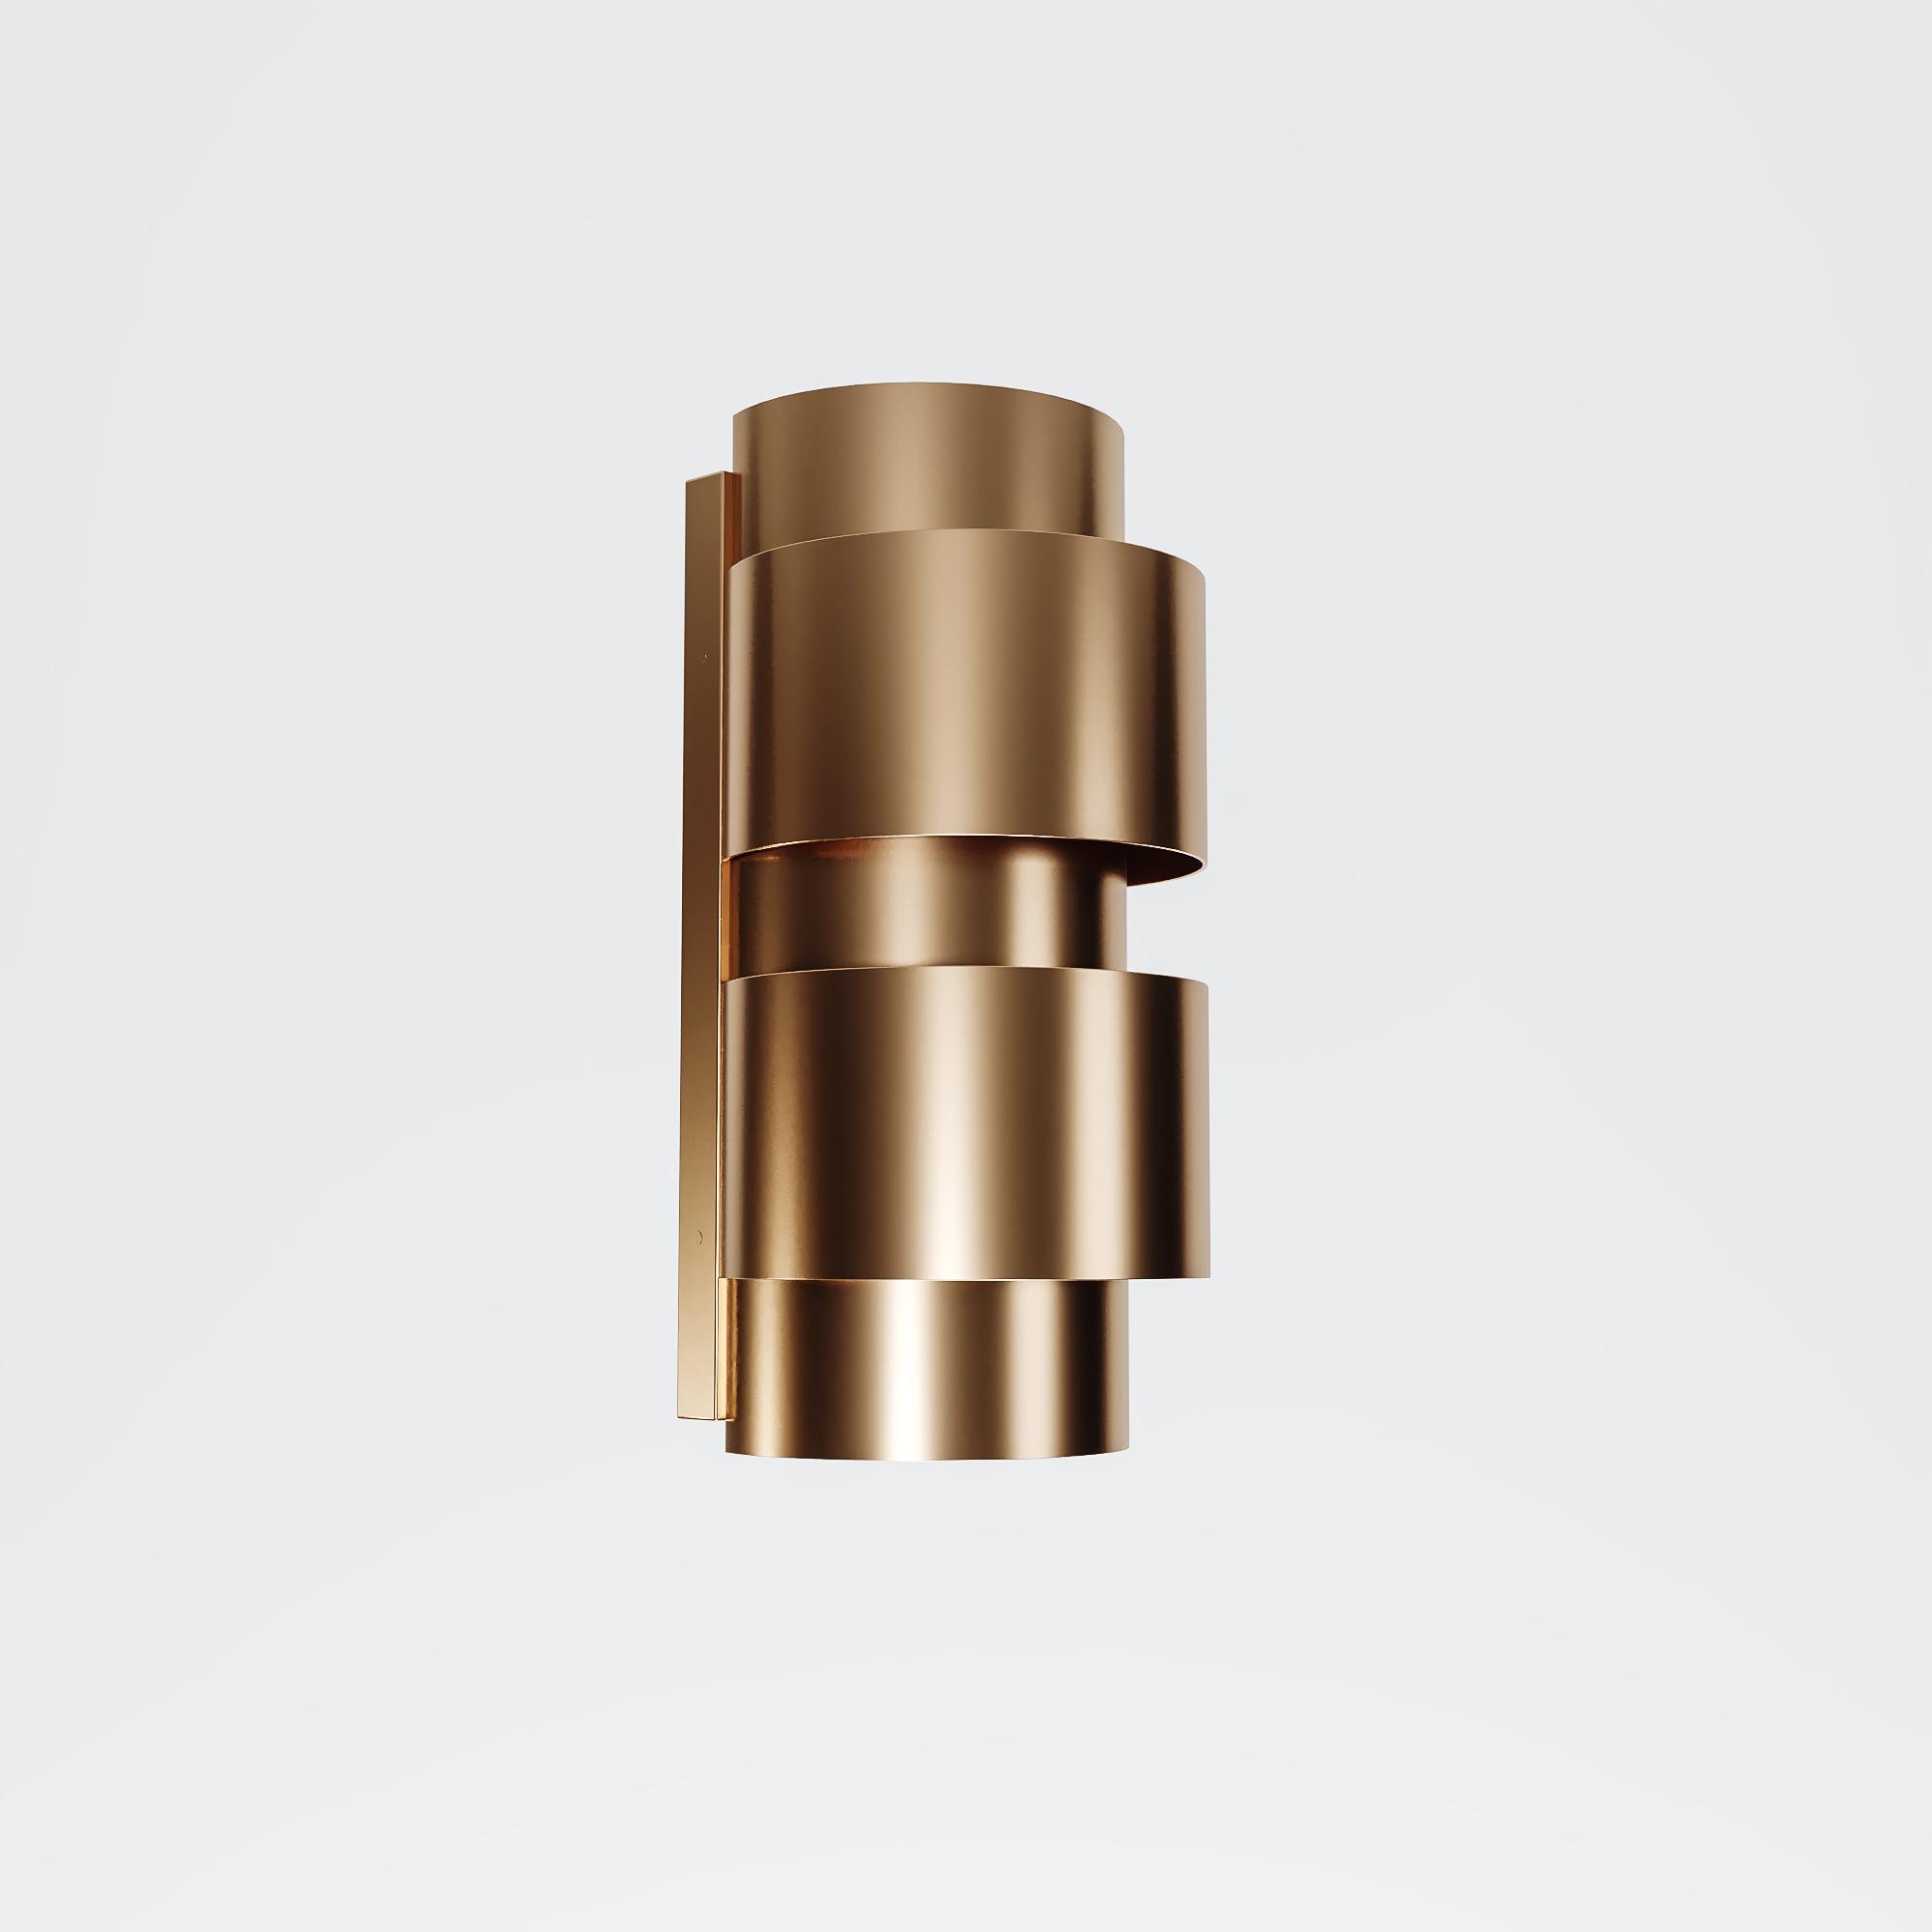 SAINT Wall light brushed brass-1